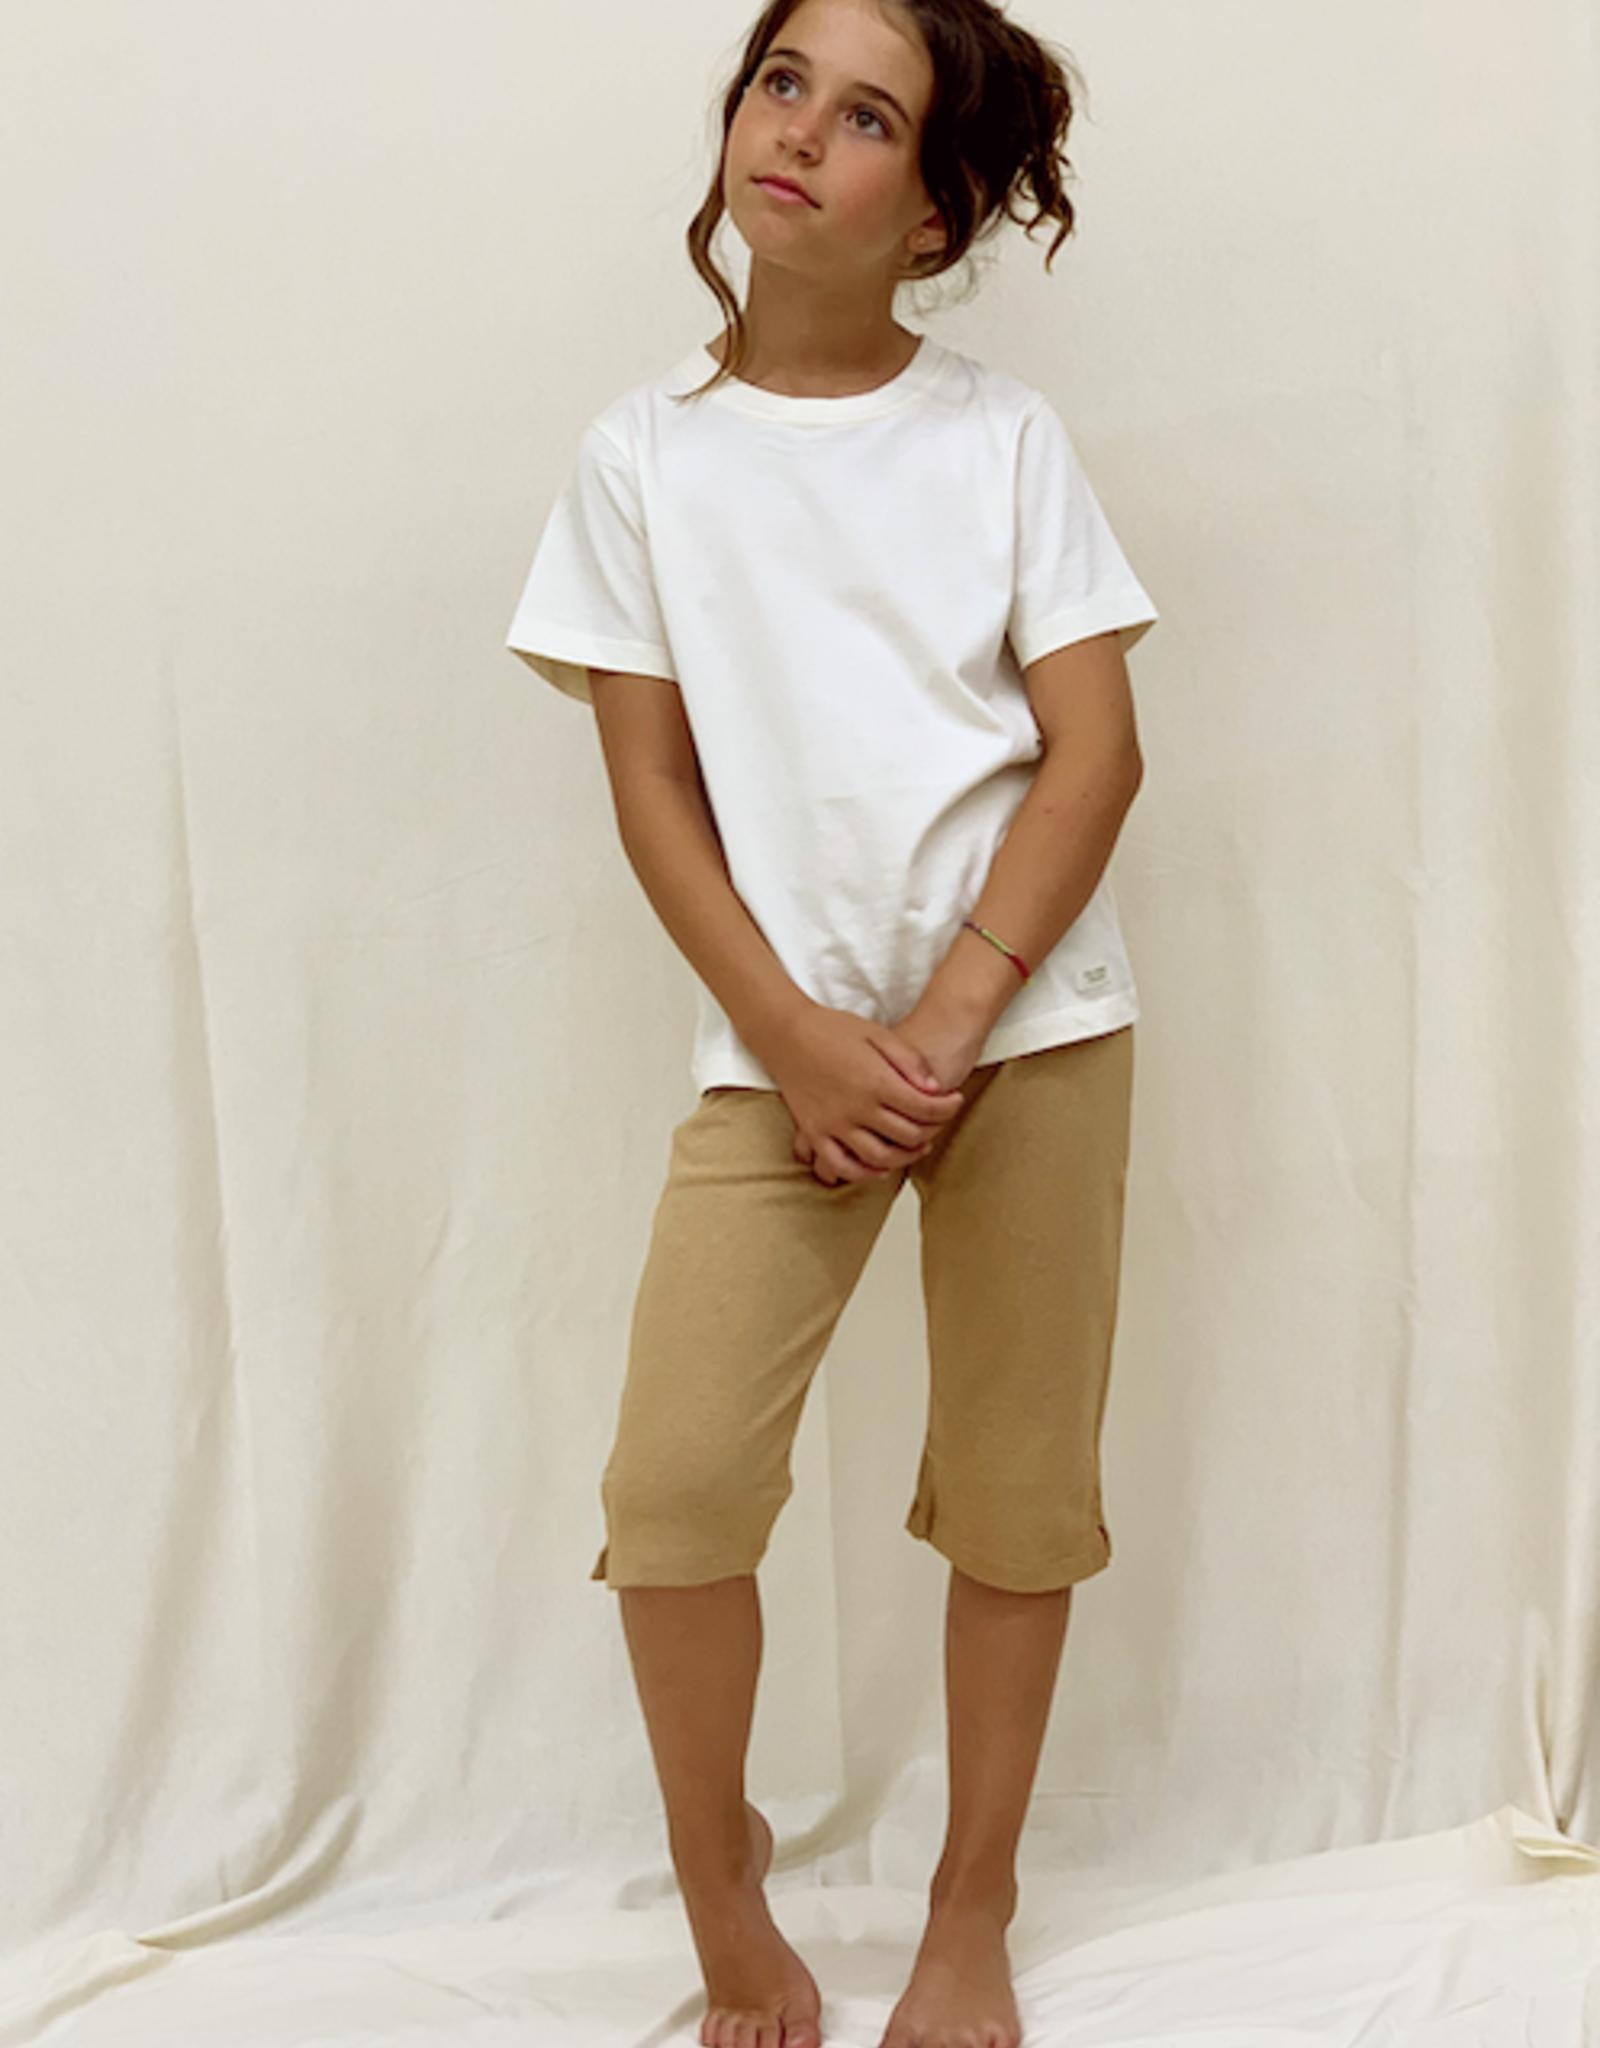 Camiseta junior listada manga corta. Tallas 8, 10, 12 años.